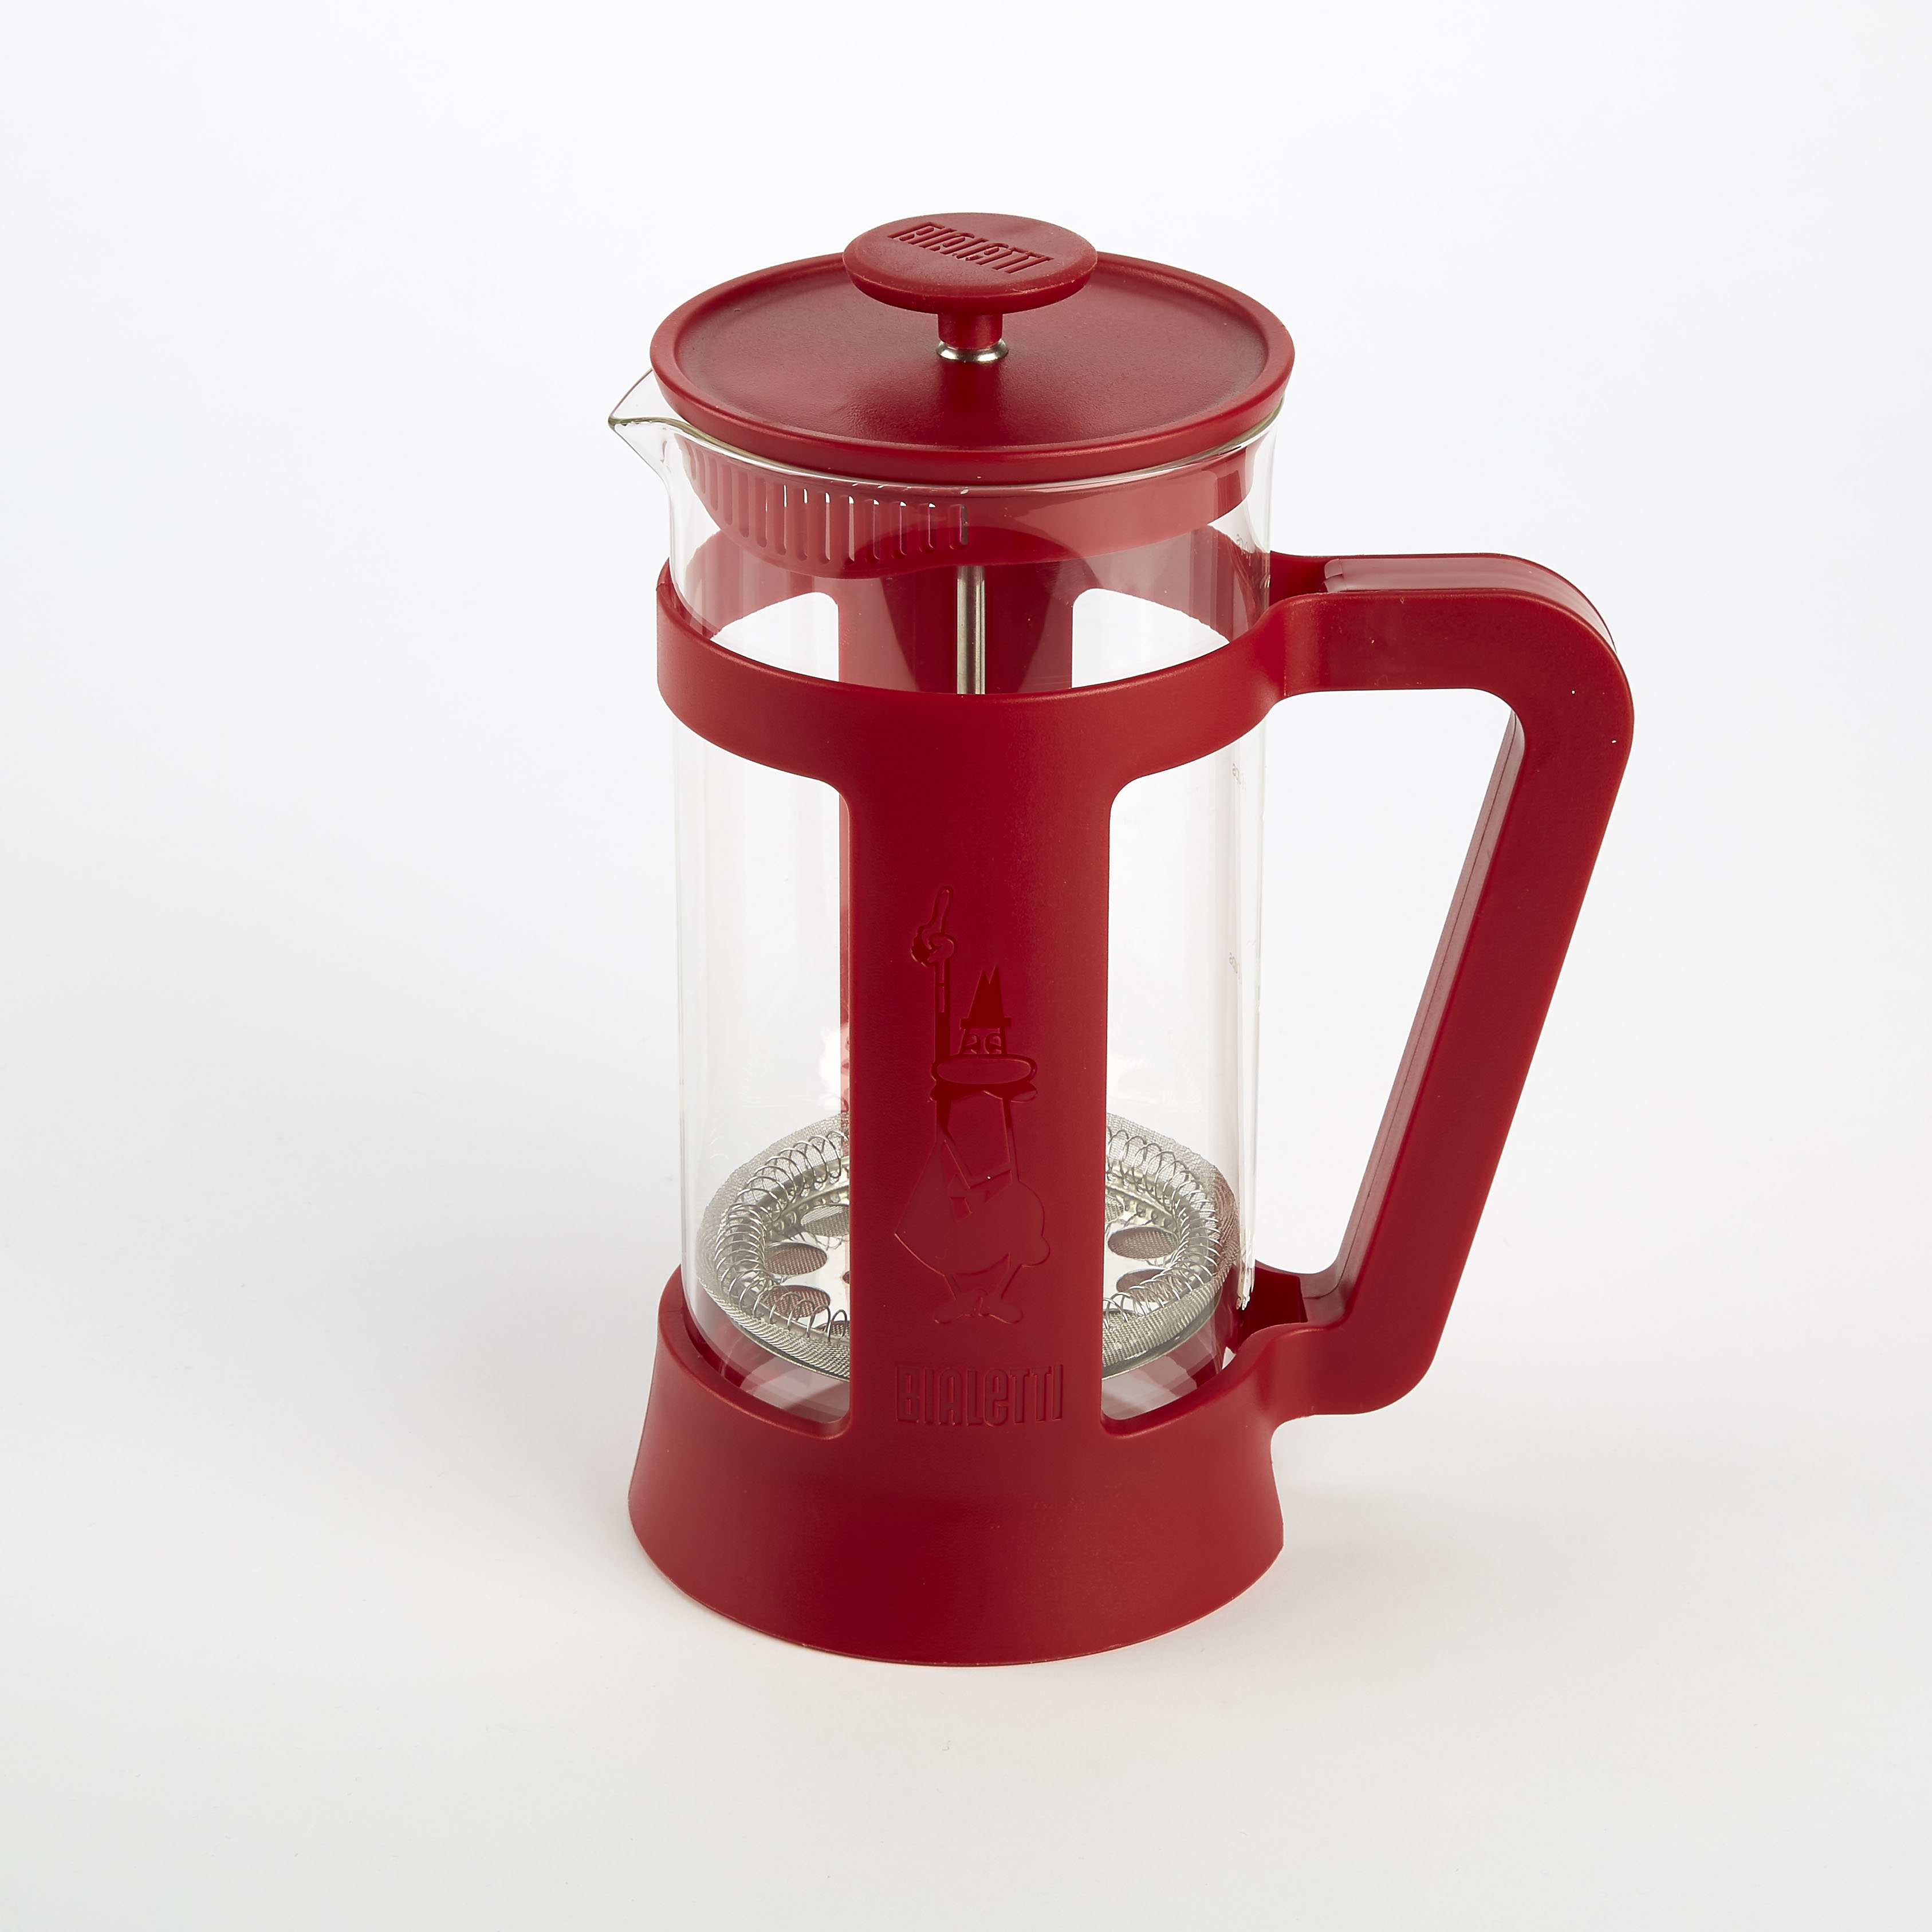 Bialetti coffee press in red